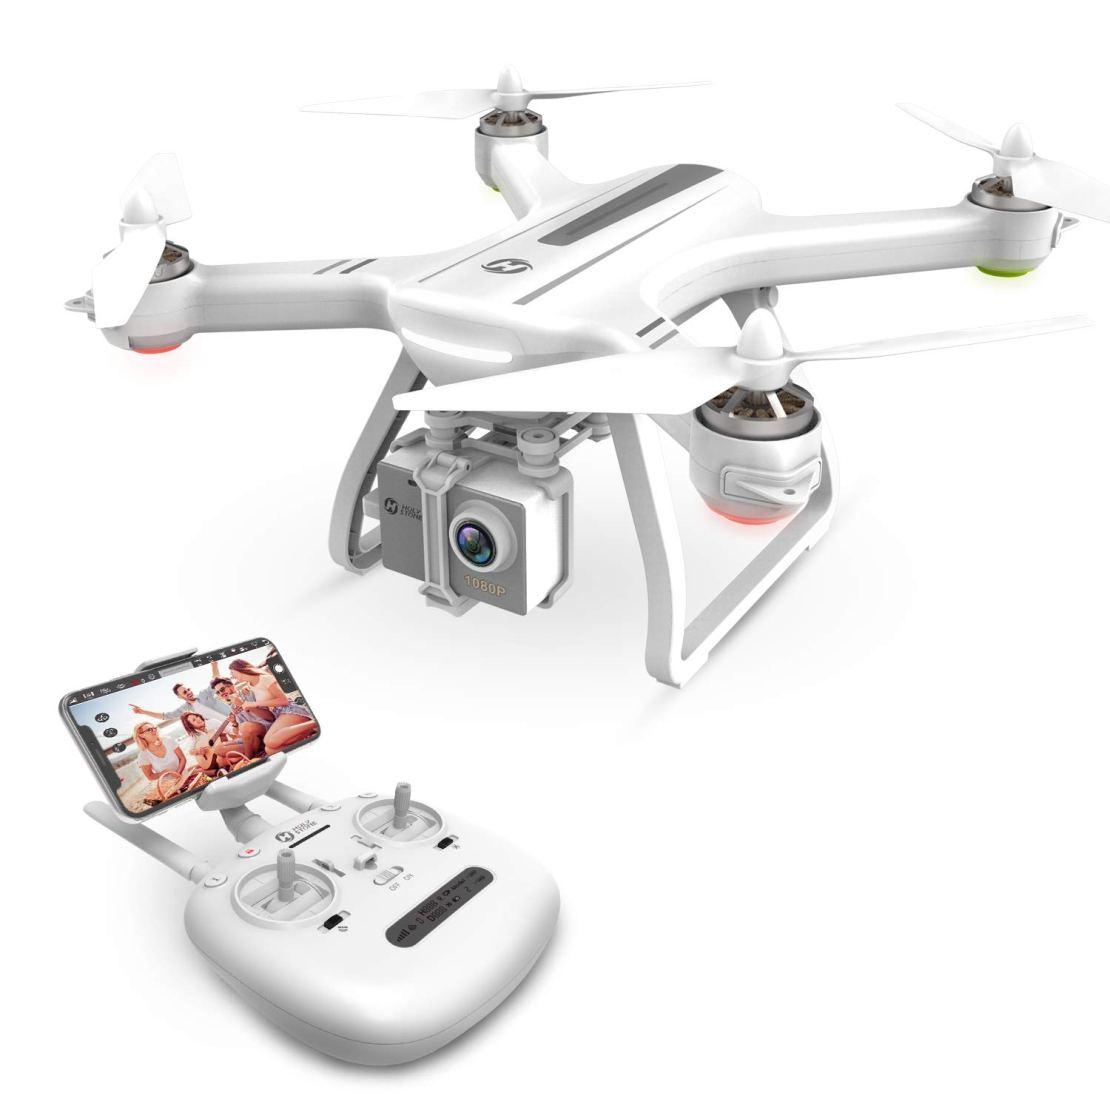 613yNMXC9kL. SL1500  - 10 Best Drones 2019